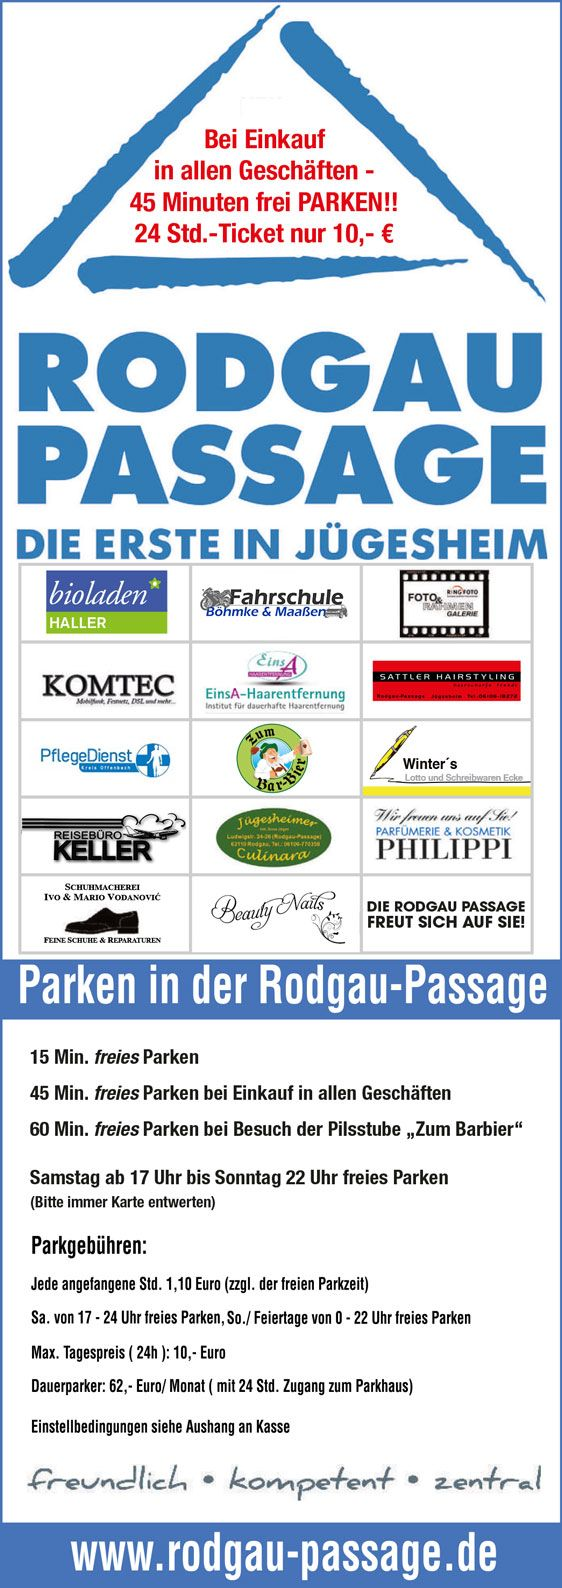 Parksystem Info Rodgau Passage